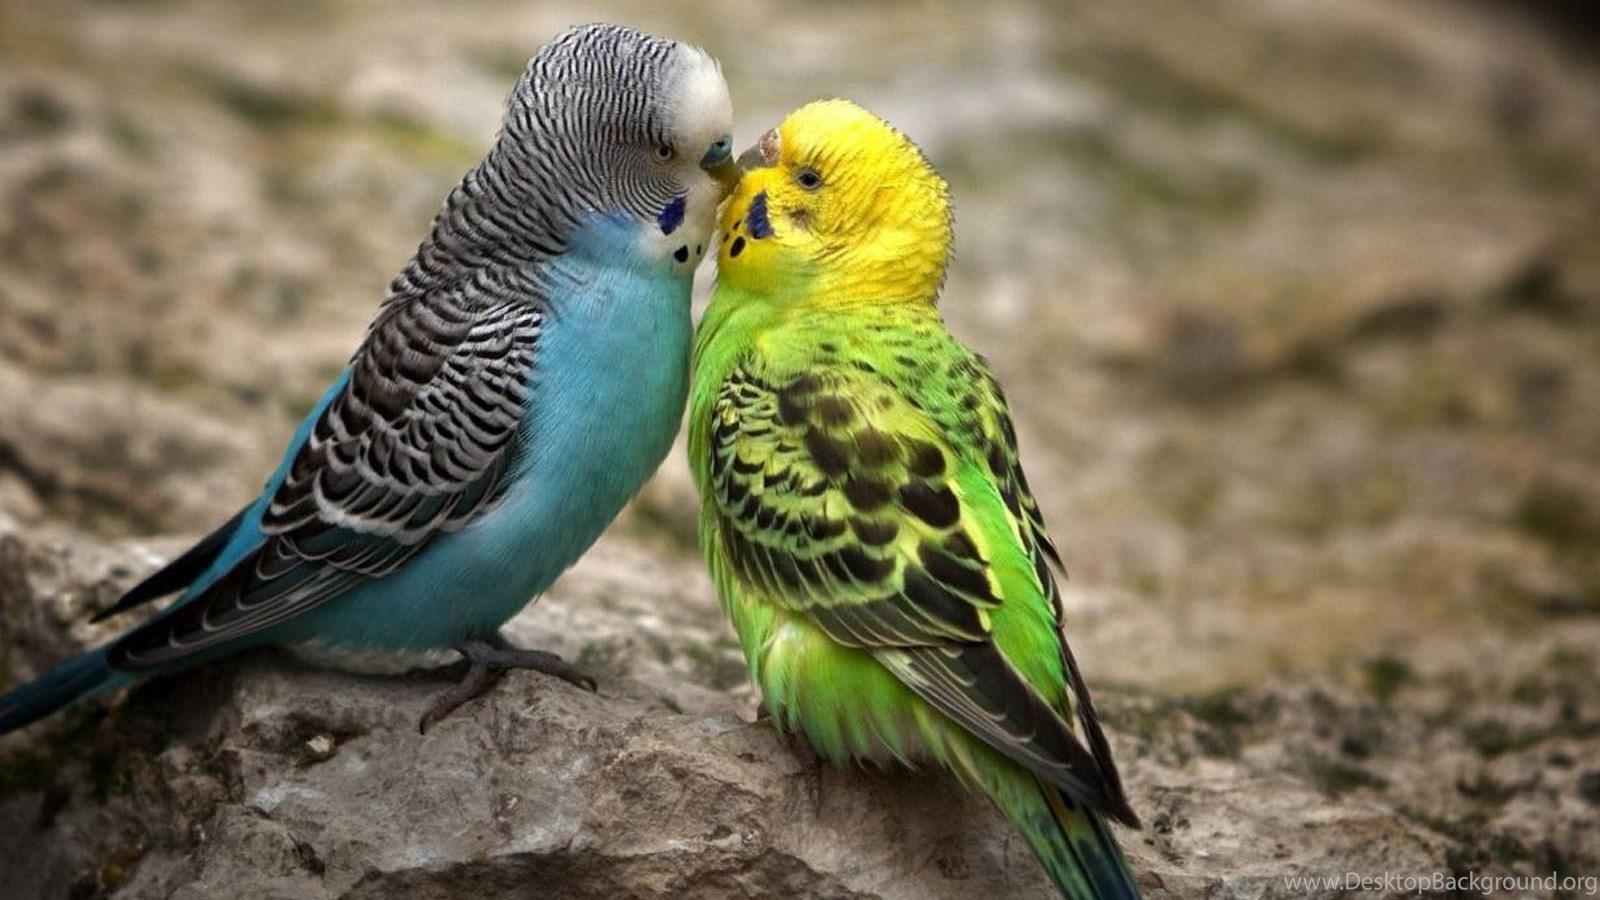 Love Birds Wallpapers Hd Wallpapers Pretty Desktop Background